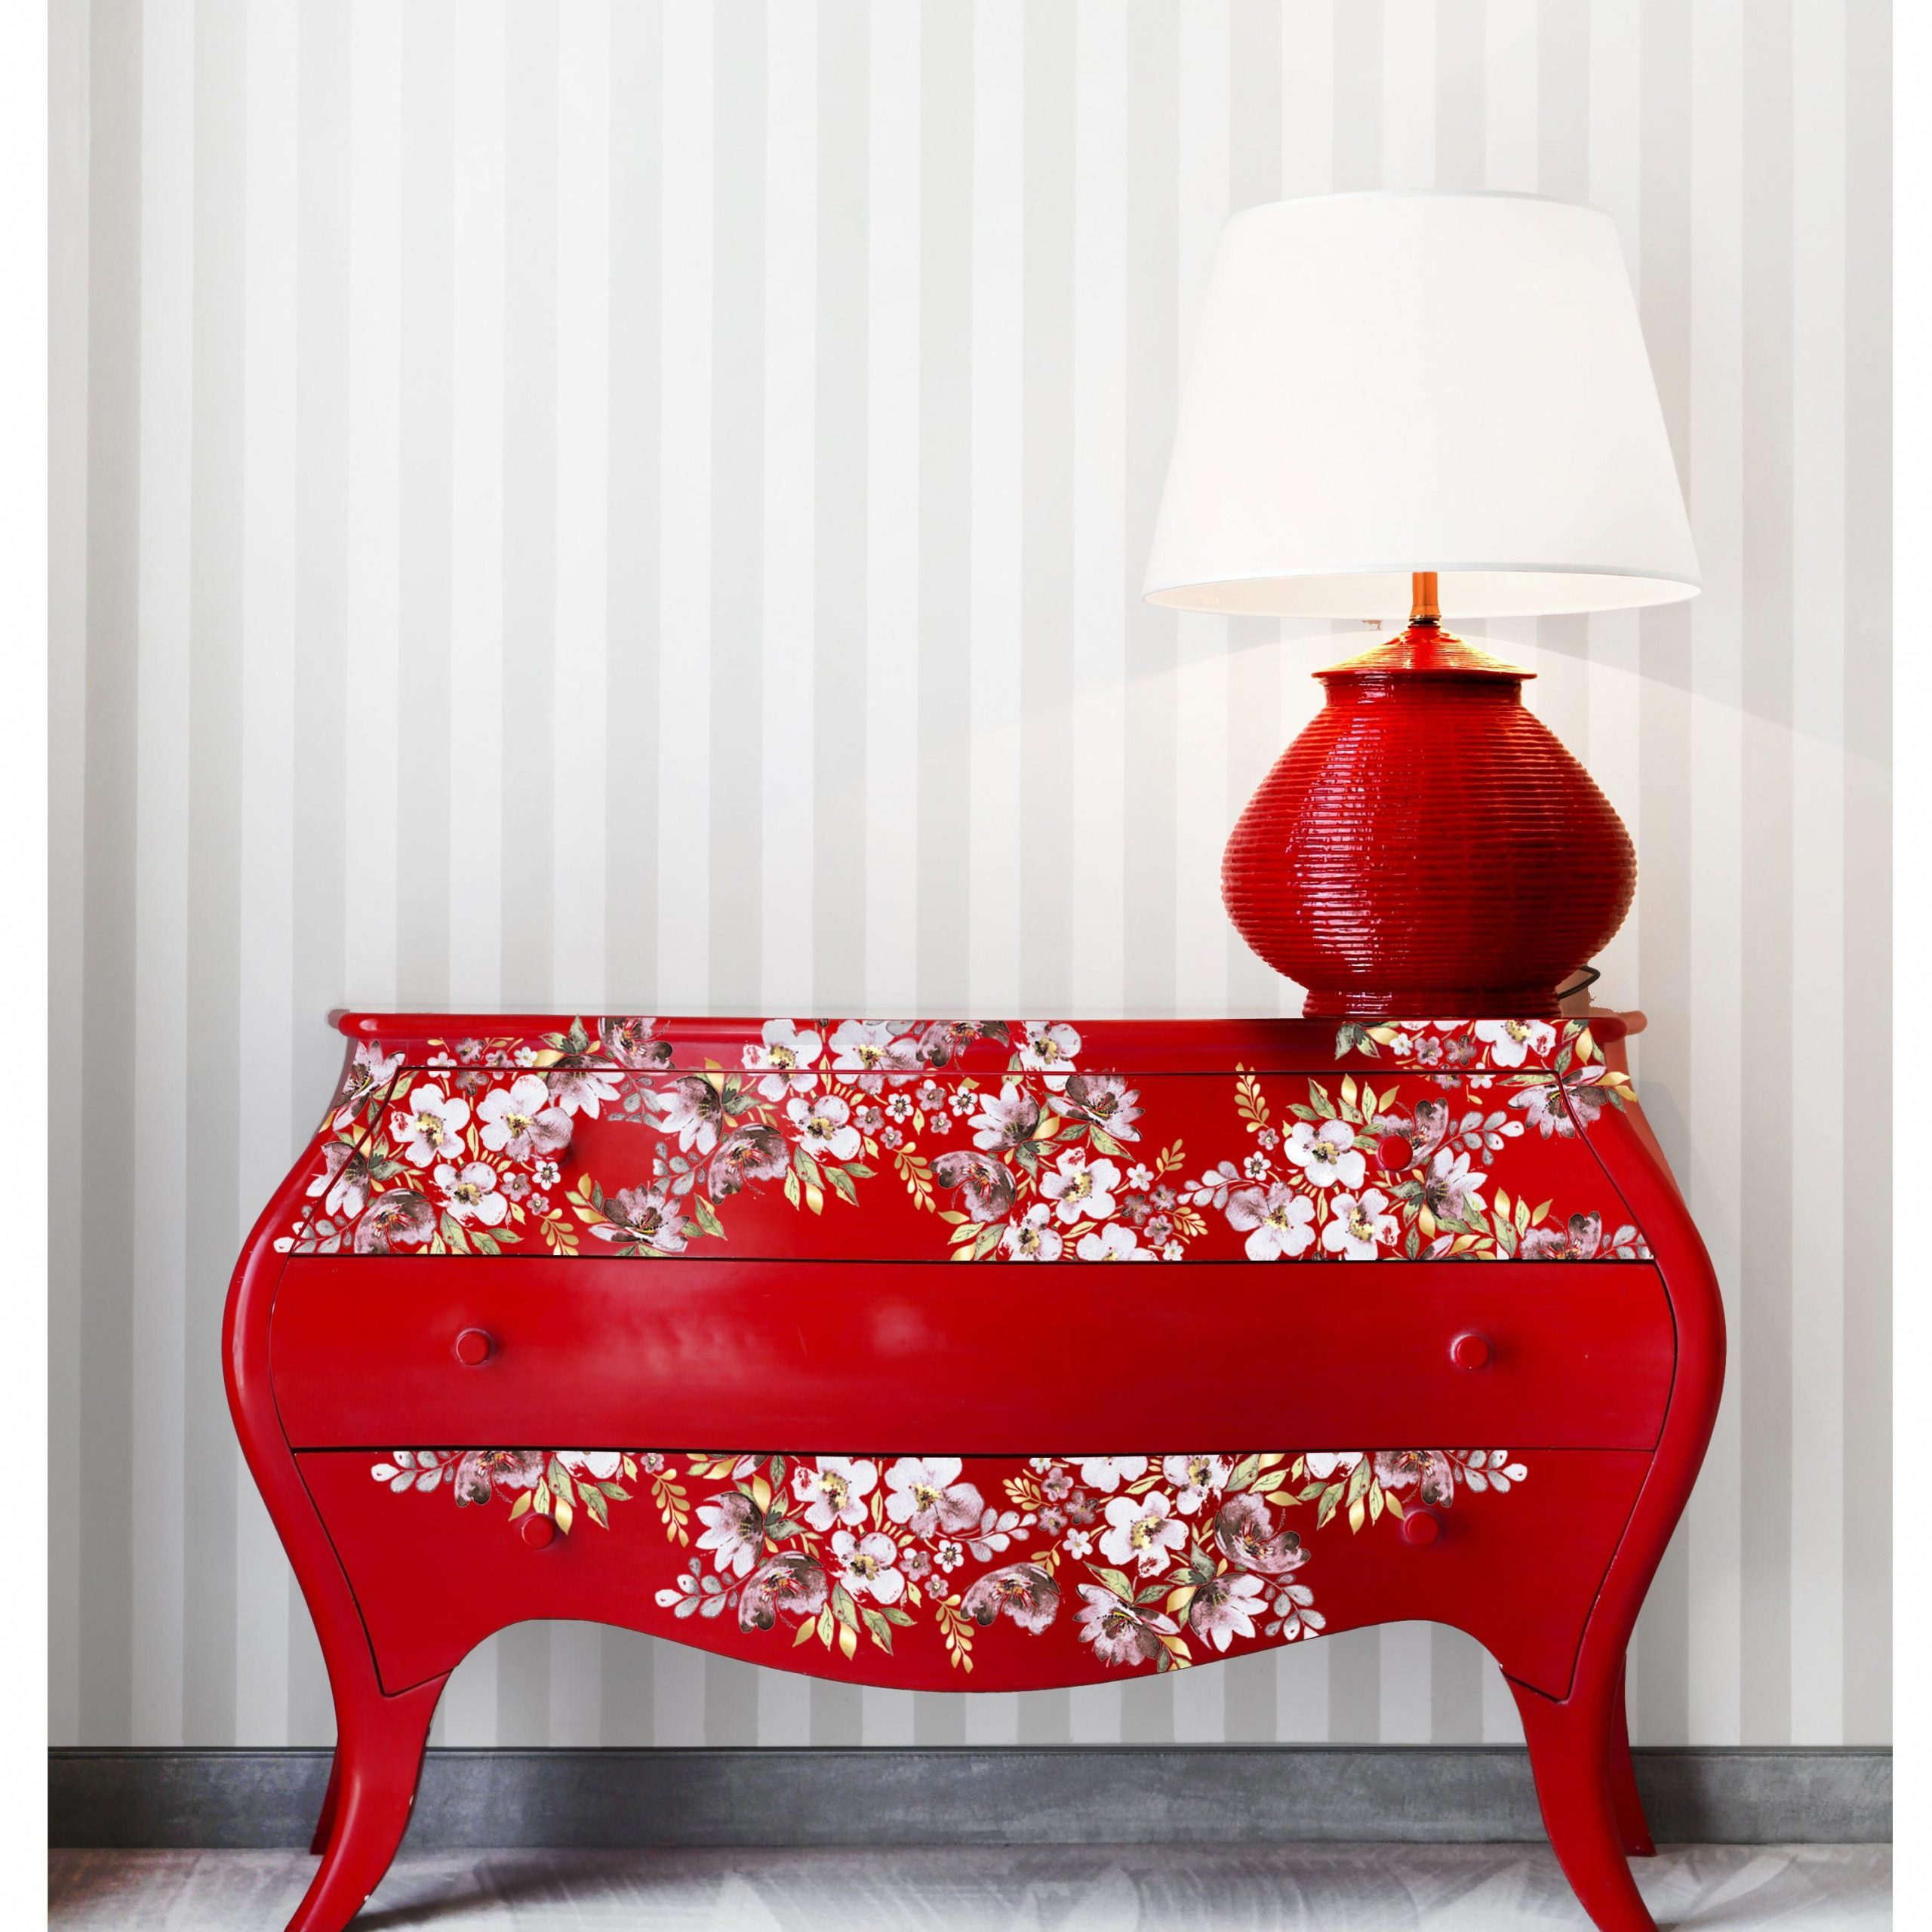 Shabby Chic Furniture Paint #Shabbychicfurniture   Decor Inside Shabby Chic Sofas (View 11 of 15)